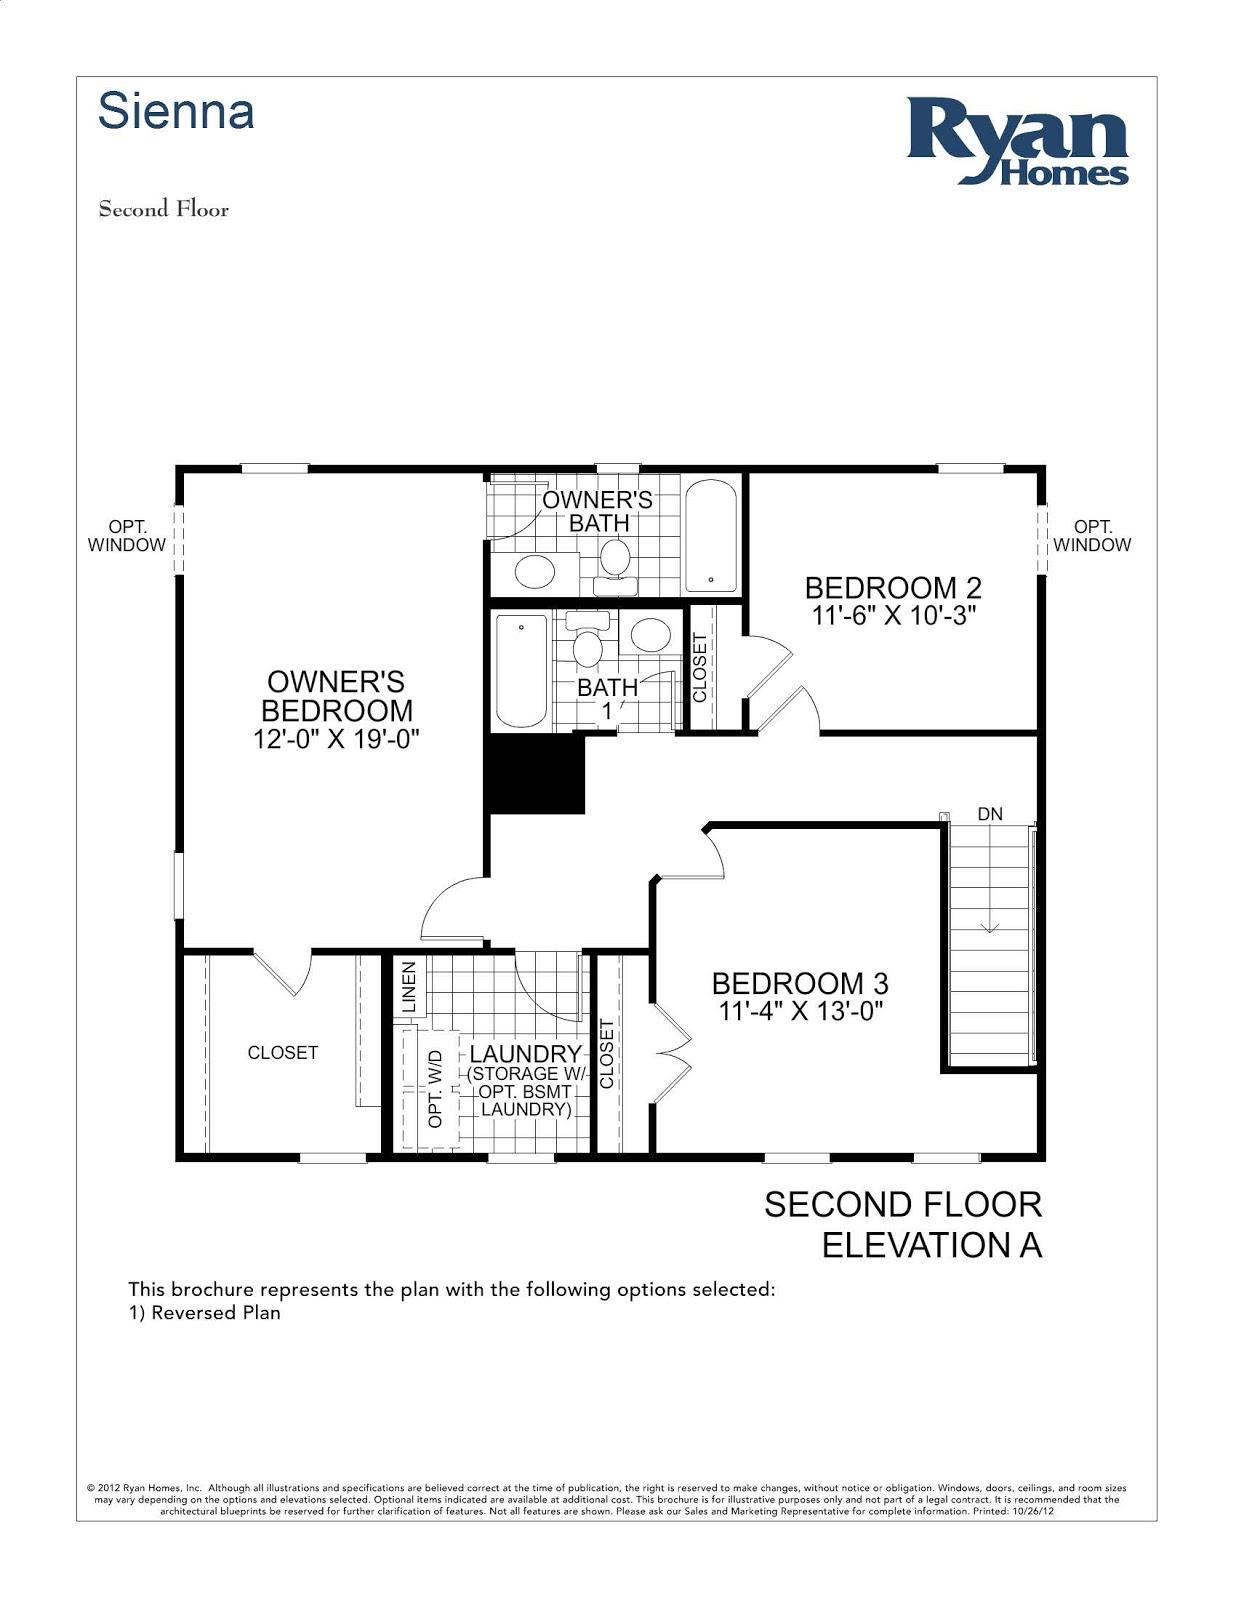 bainbridge ryan homes floor plan home decor ideas